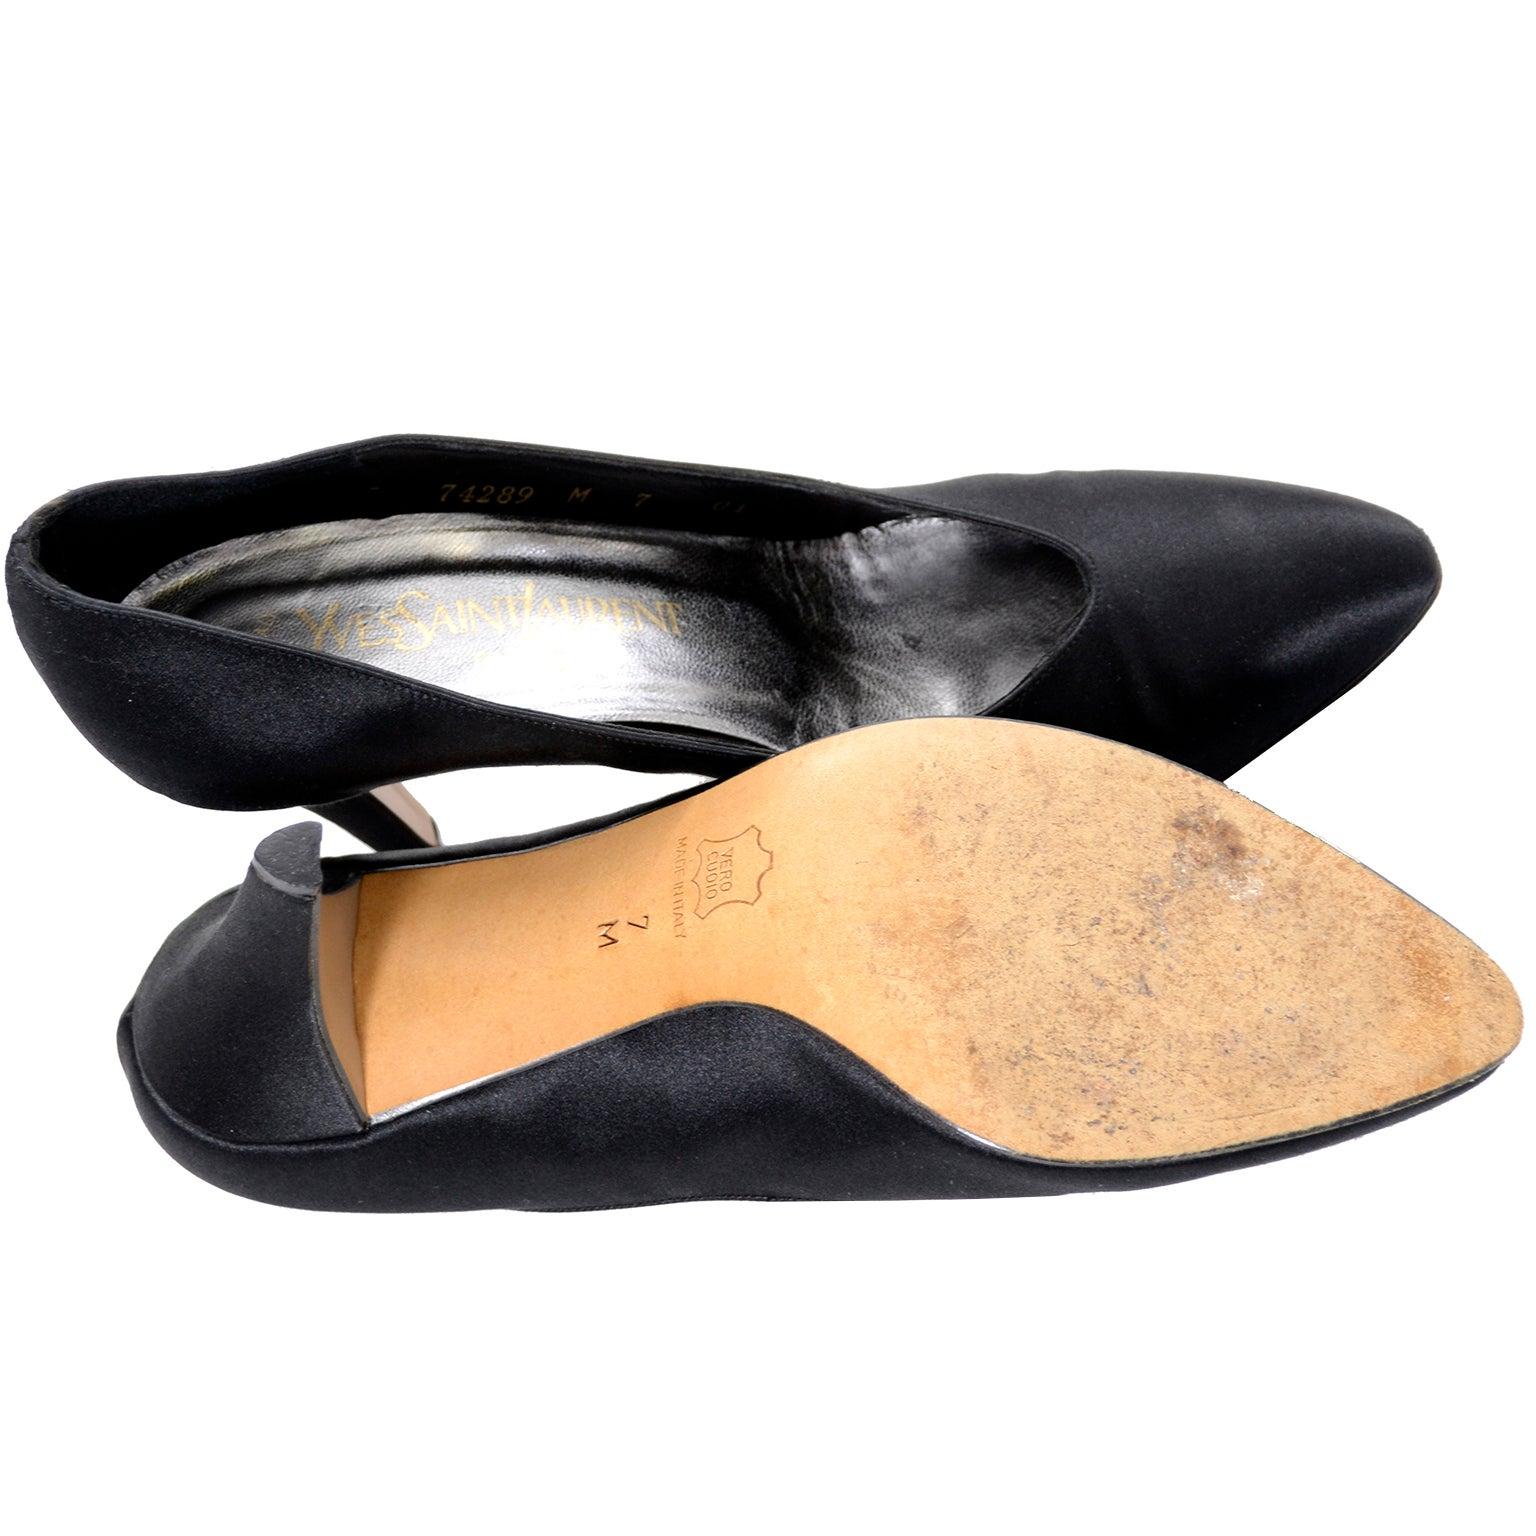 24e14a64a Yves Saint Laurent YSL Vintage Black Satin Shoes Heels 7M For Sale at  1stdibs